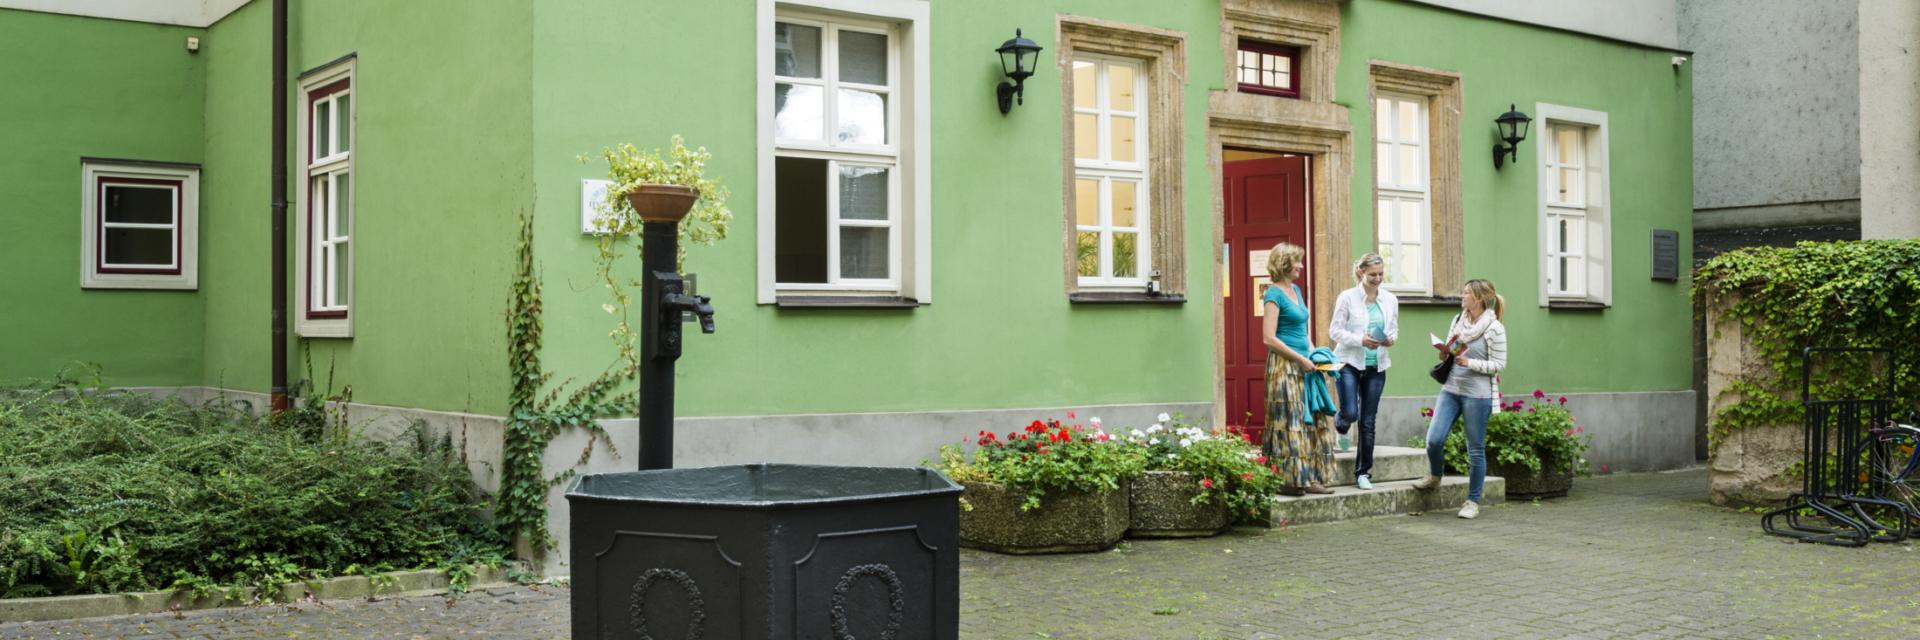 Frühromantiker in Jena / Gäste verlassen glücklich das Romantikerhaus in Jena © JenaKultur, Foto: Andreas Hub